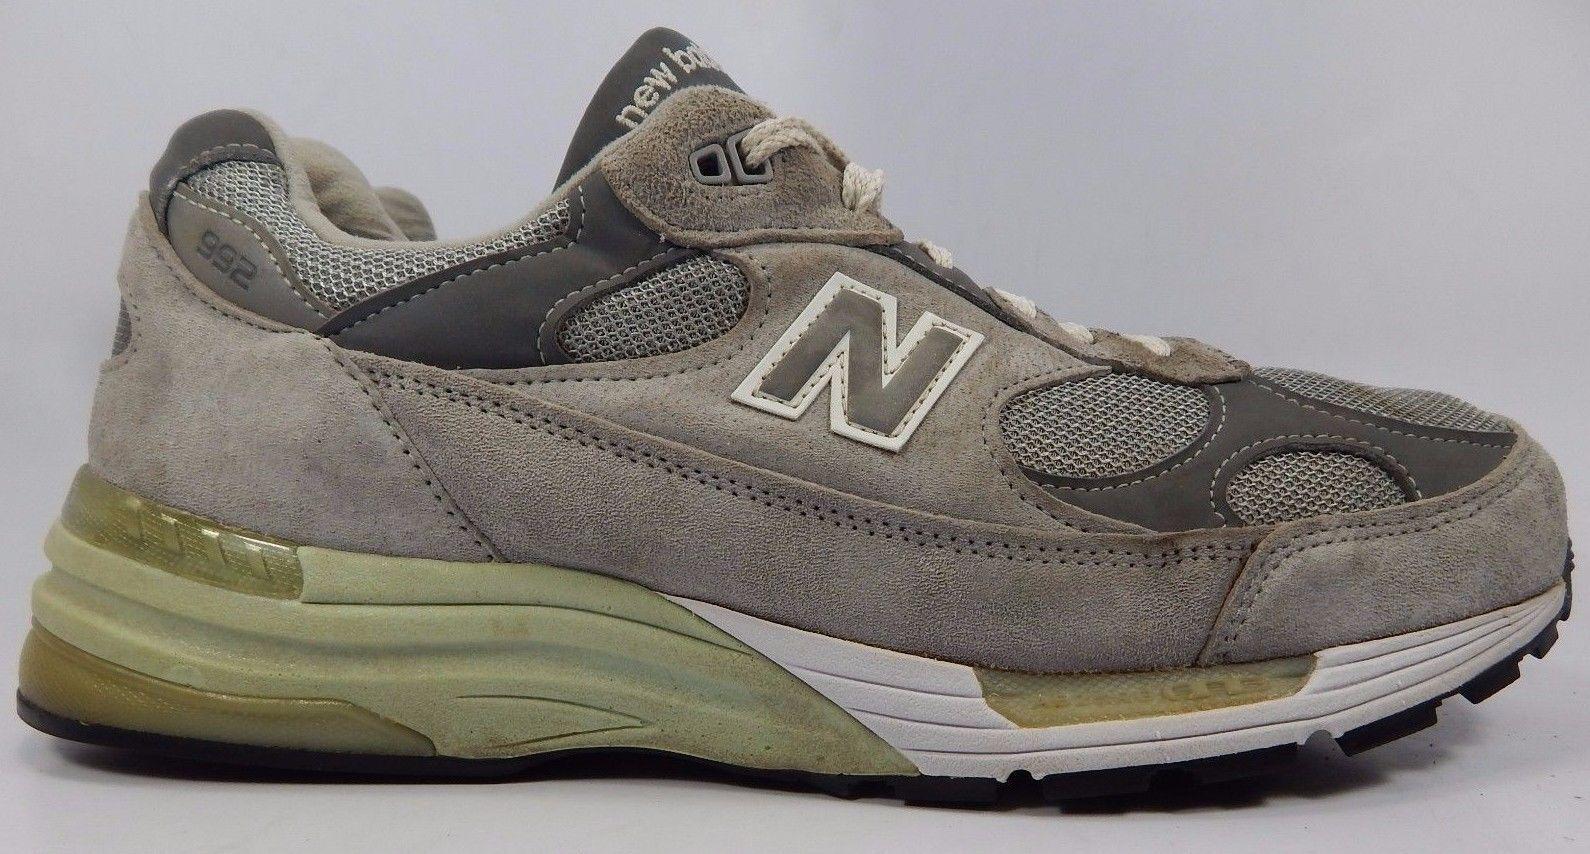 quality design 6f4c2 f116e ... good new balance 992 mens running shoes size us 12 2e wide eu 46.5 gray  m992gl